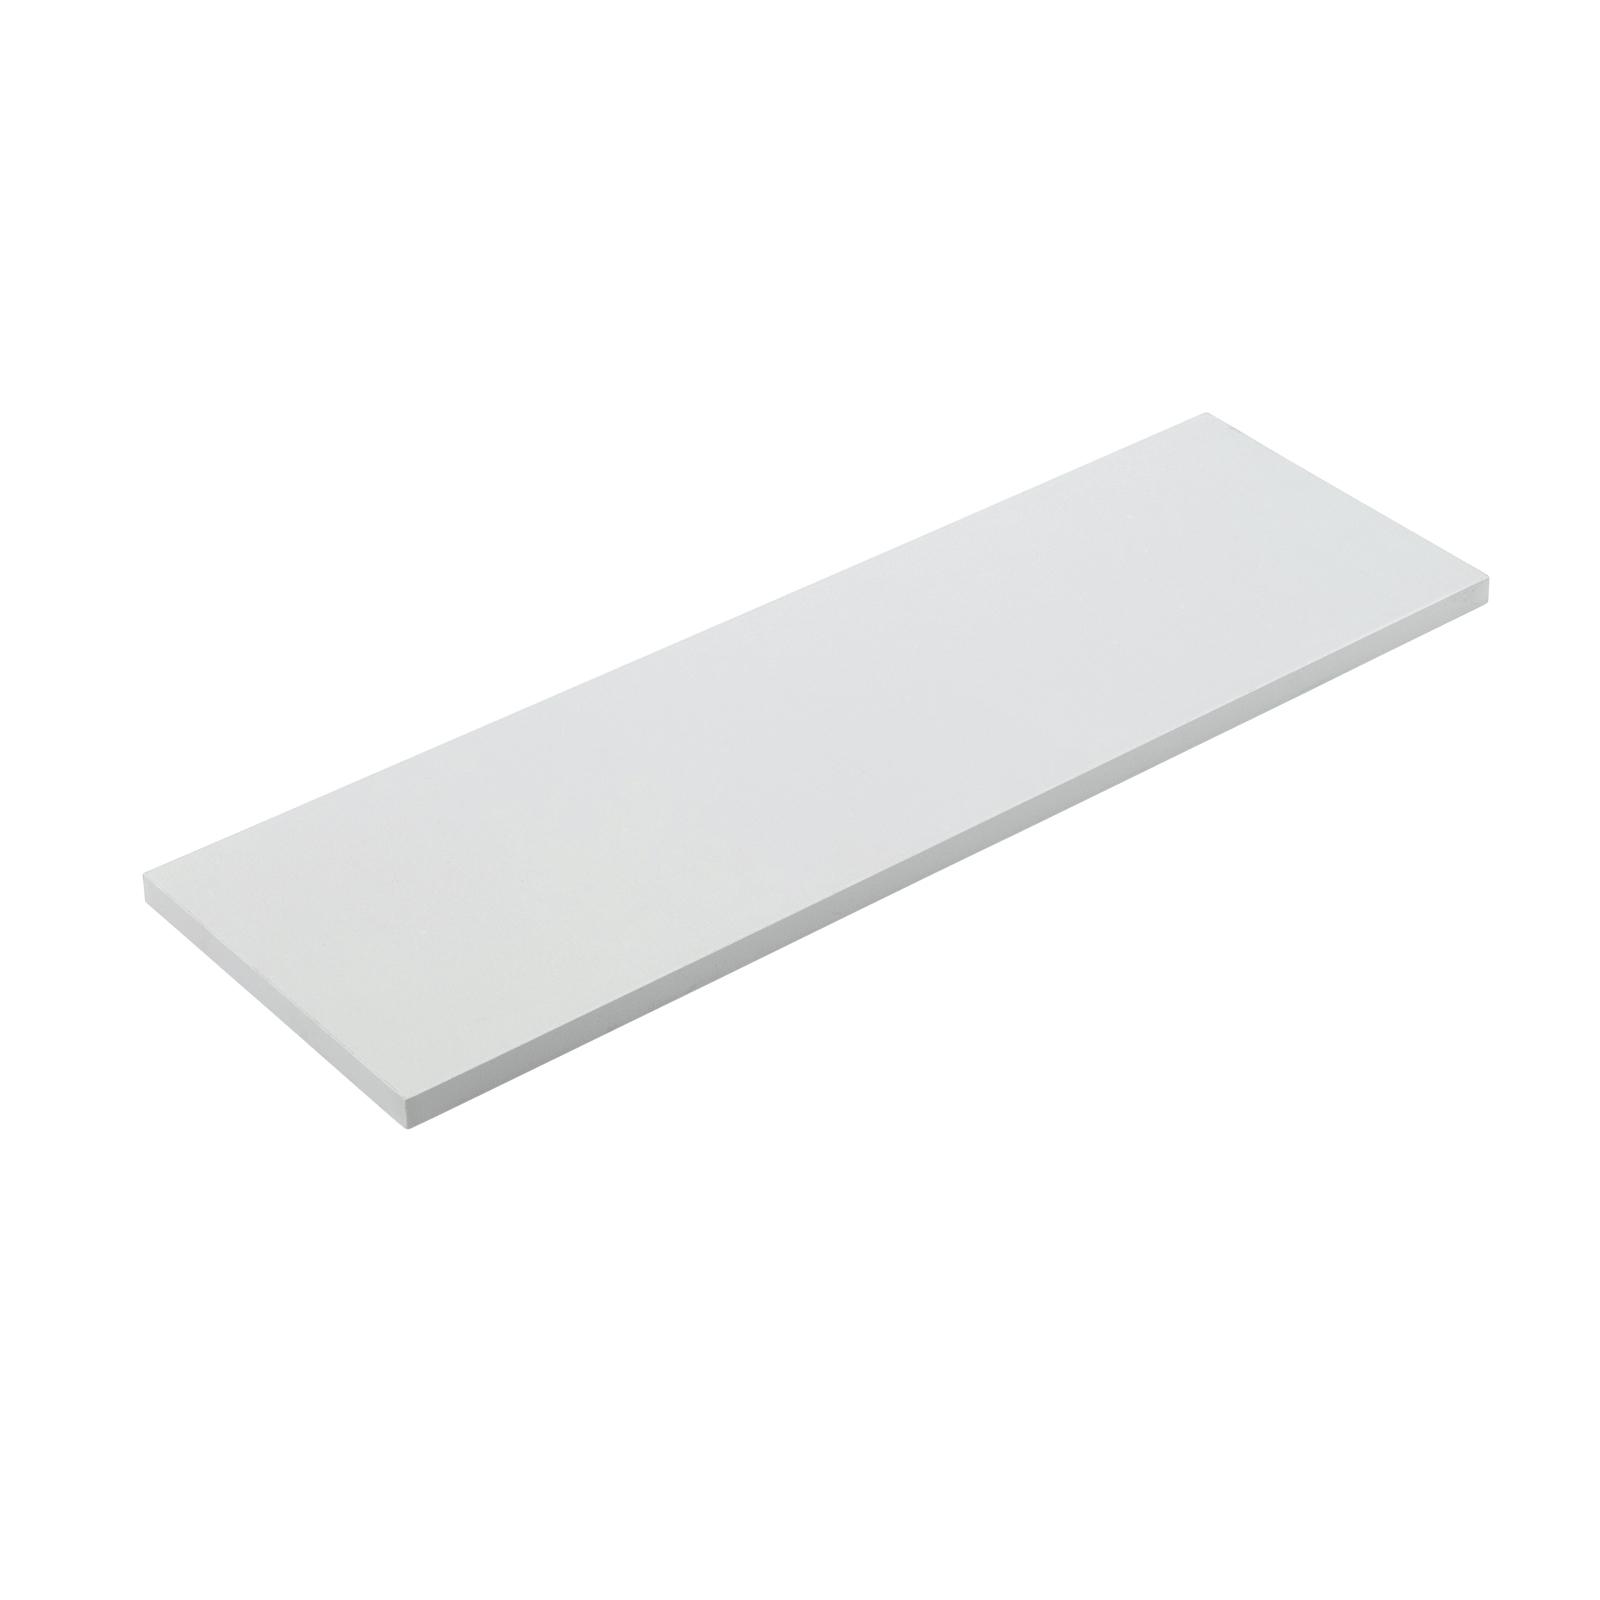 Flexi Storage Home Solutions 600 x 16 x 200mm White Shelf